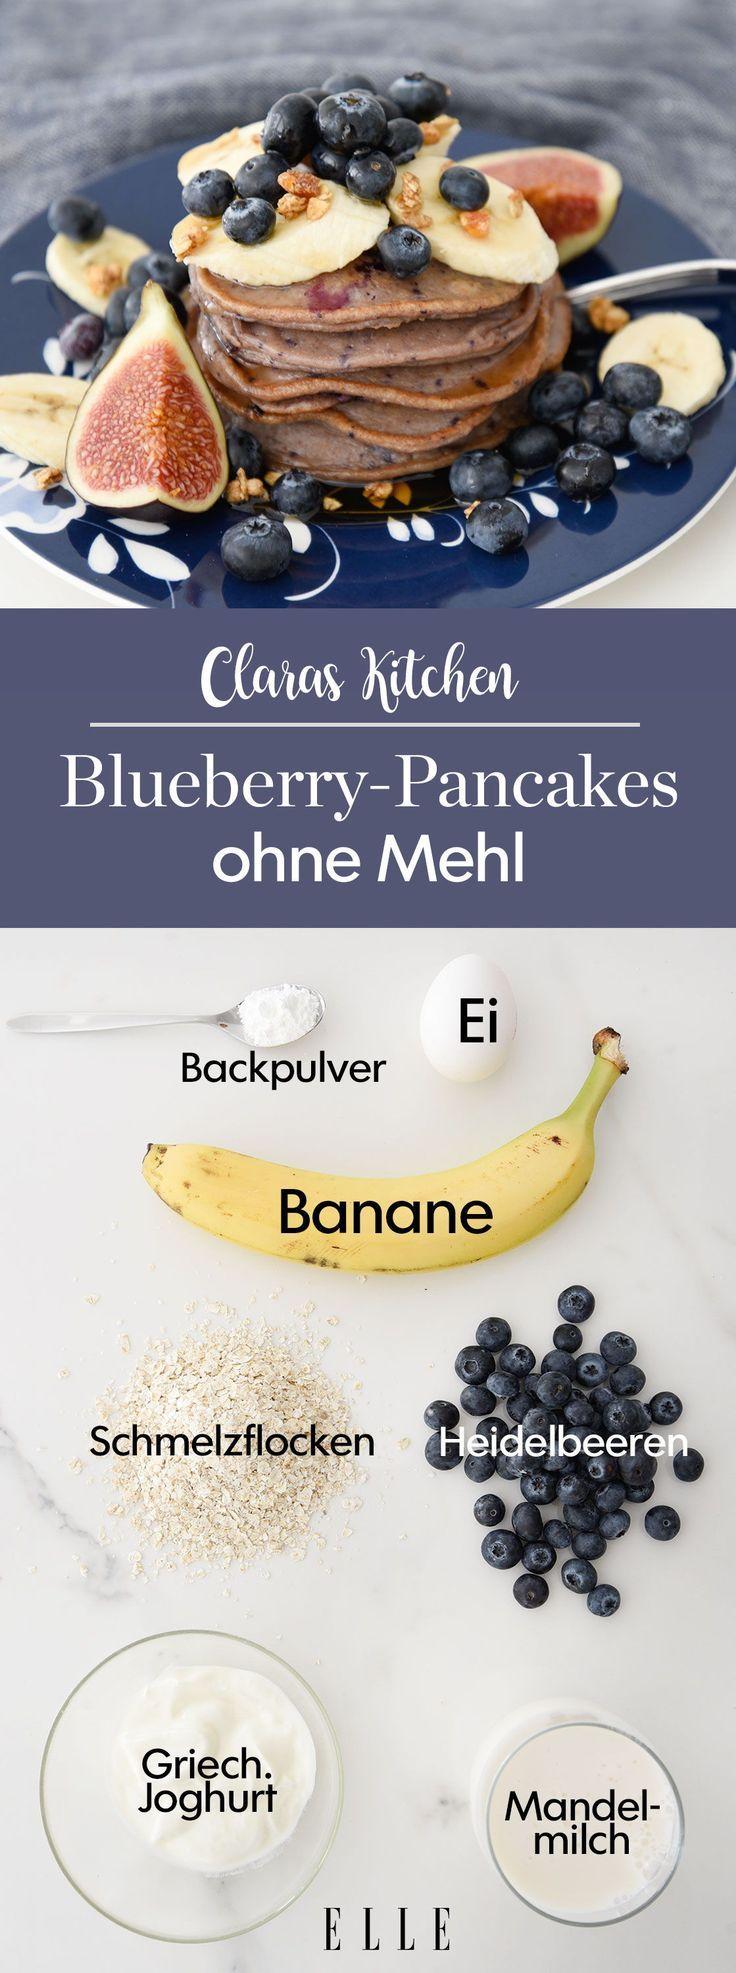 Blaubeer-Pancakes mit Bananen, das Rezept